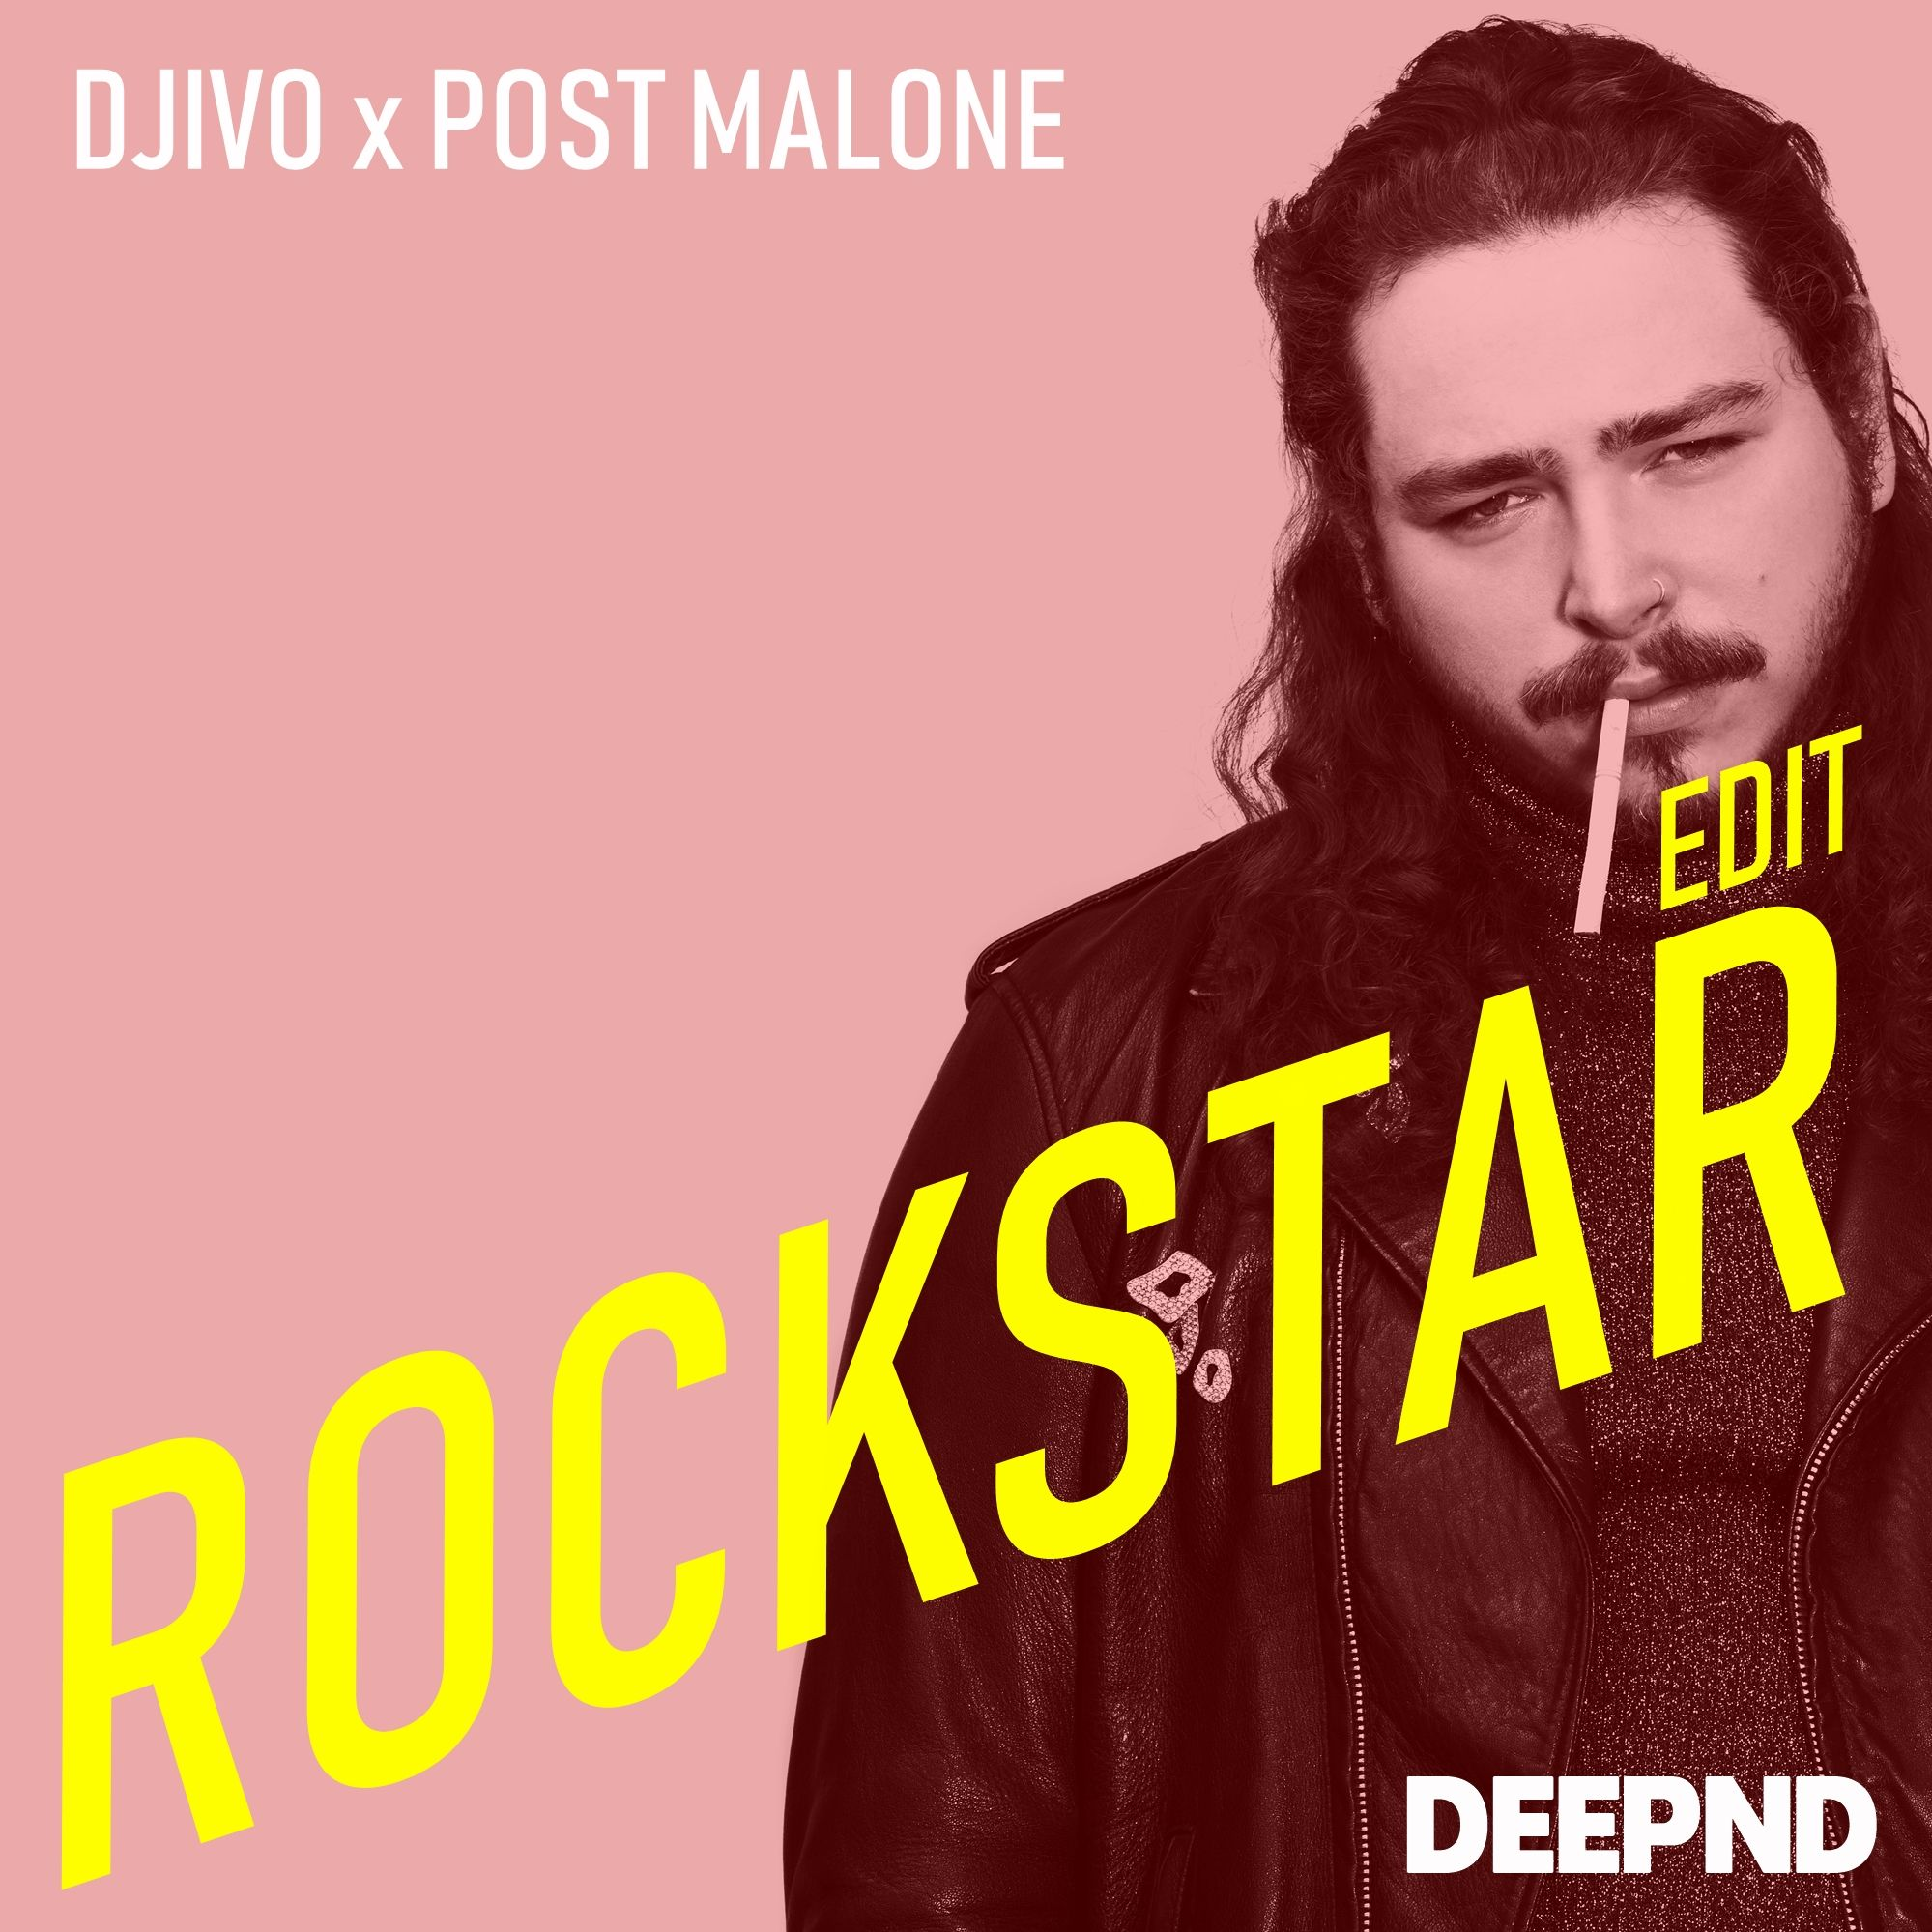 Post Malone Hit This Hard: Rockstar (Edit) By DJIVO X Post